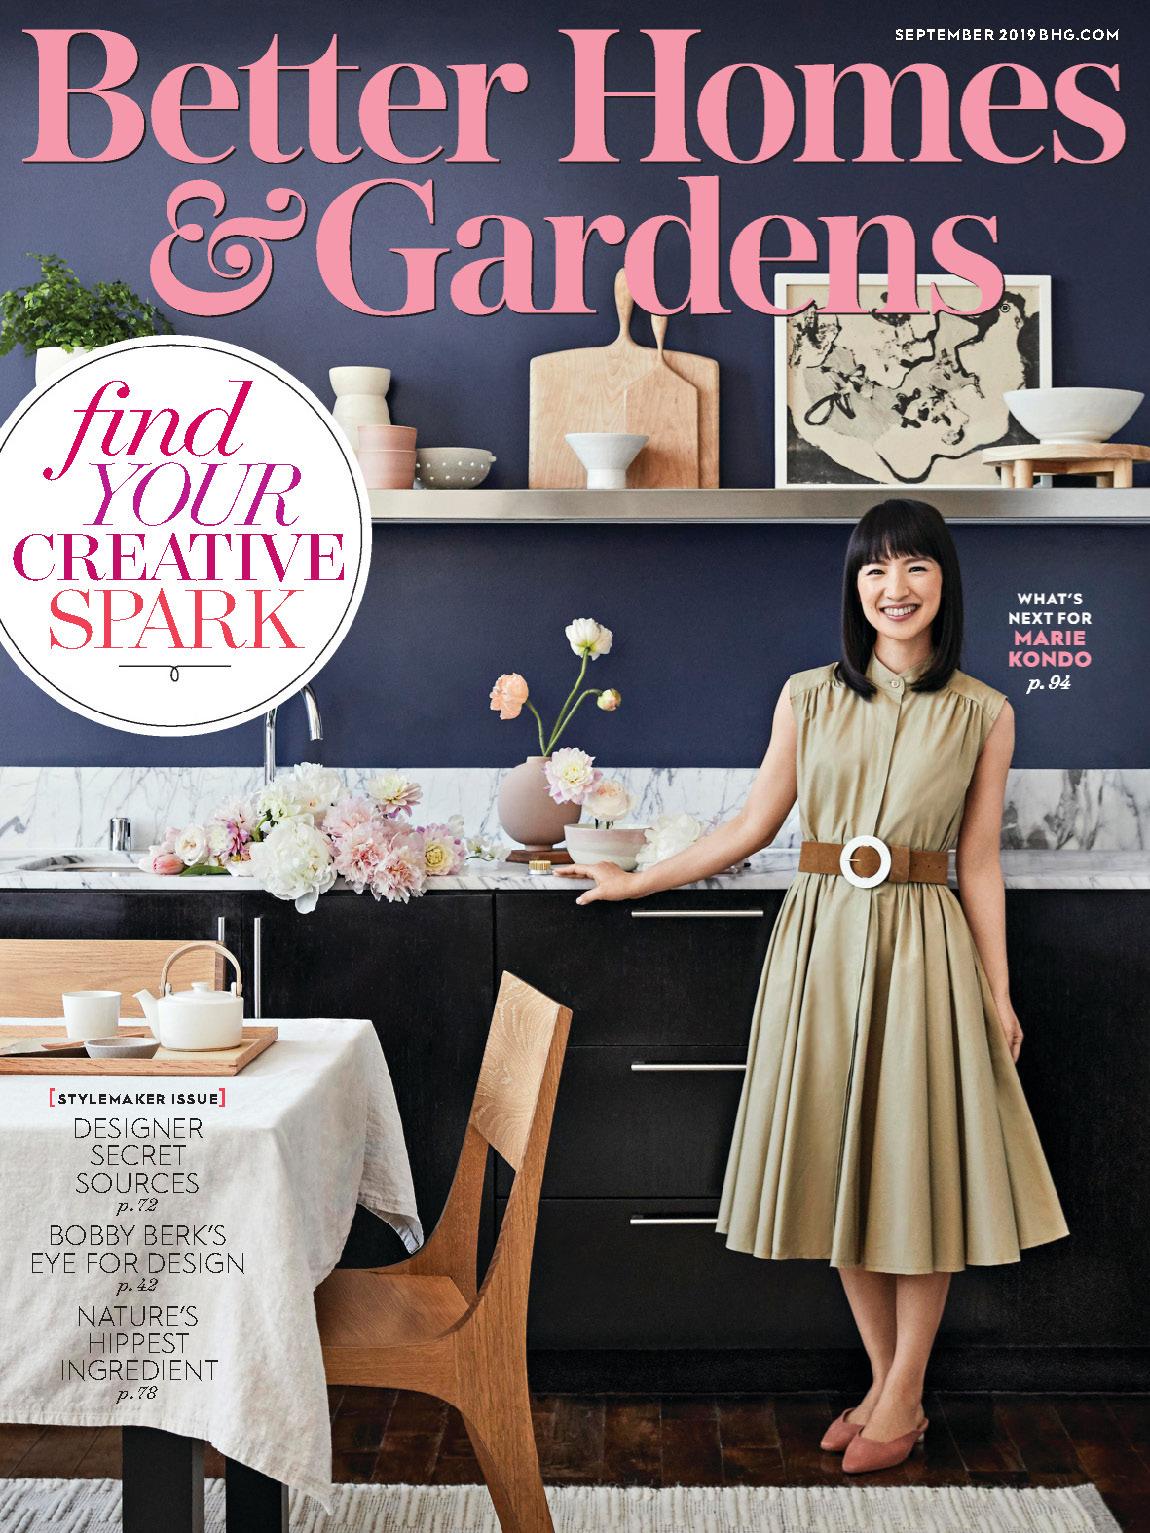 《Better Homes and Gardens》美国版时尚家居杂志2019年09月号